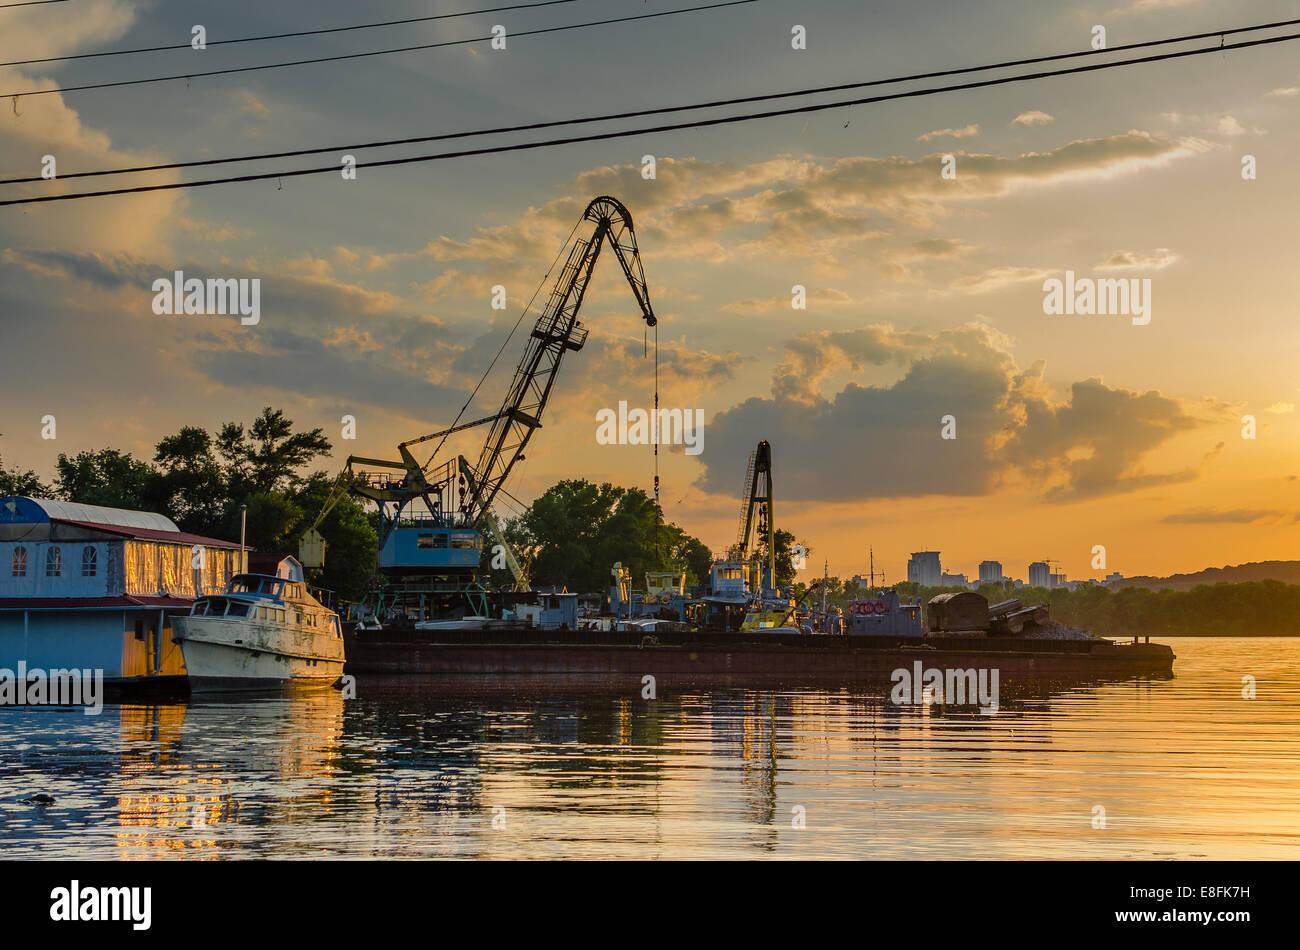 Ukraine, Kiew, alte Dock und Schiff Stockbild